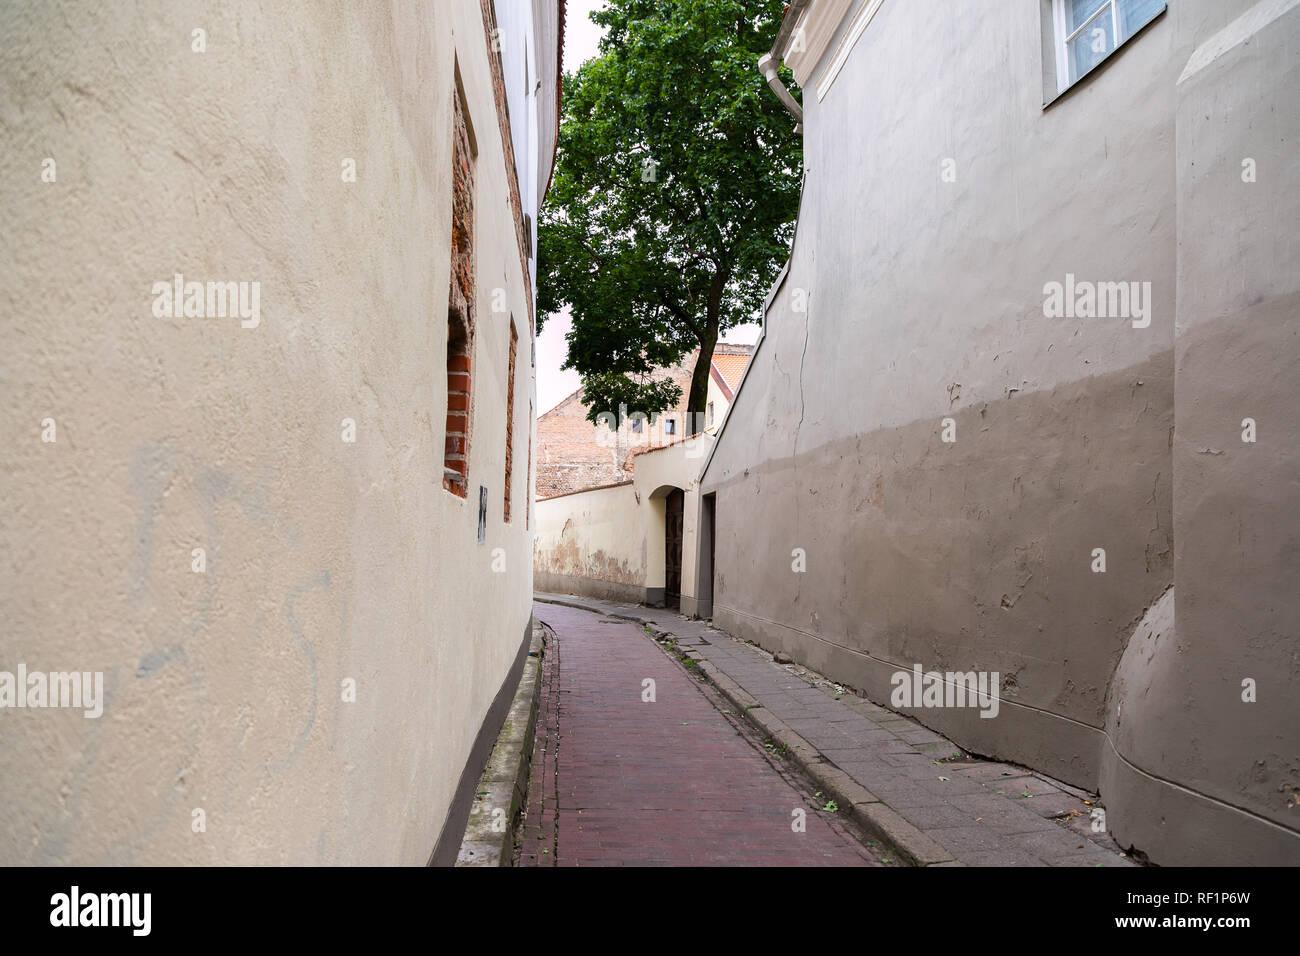 Vilnius old town street, Lithuania - Stock Image